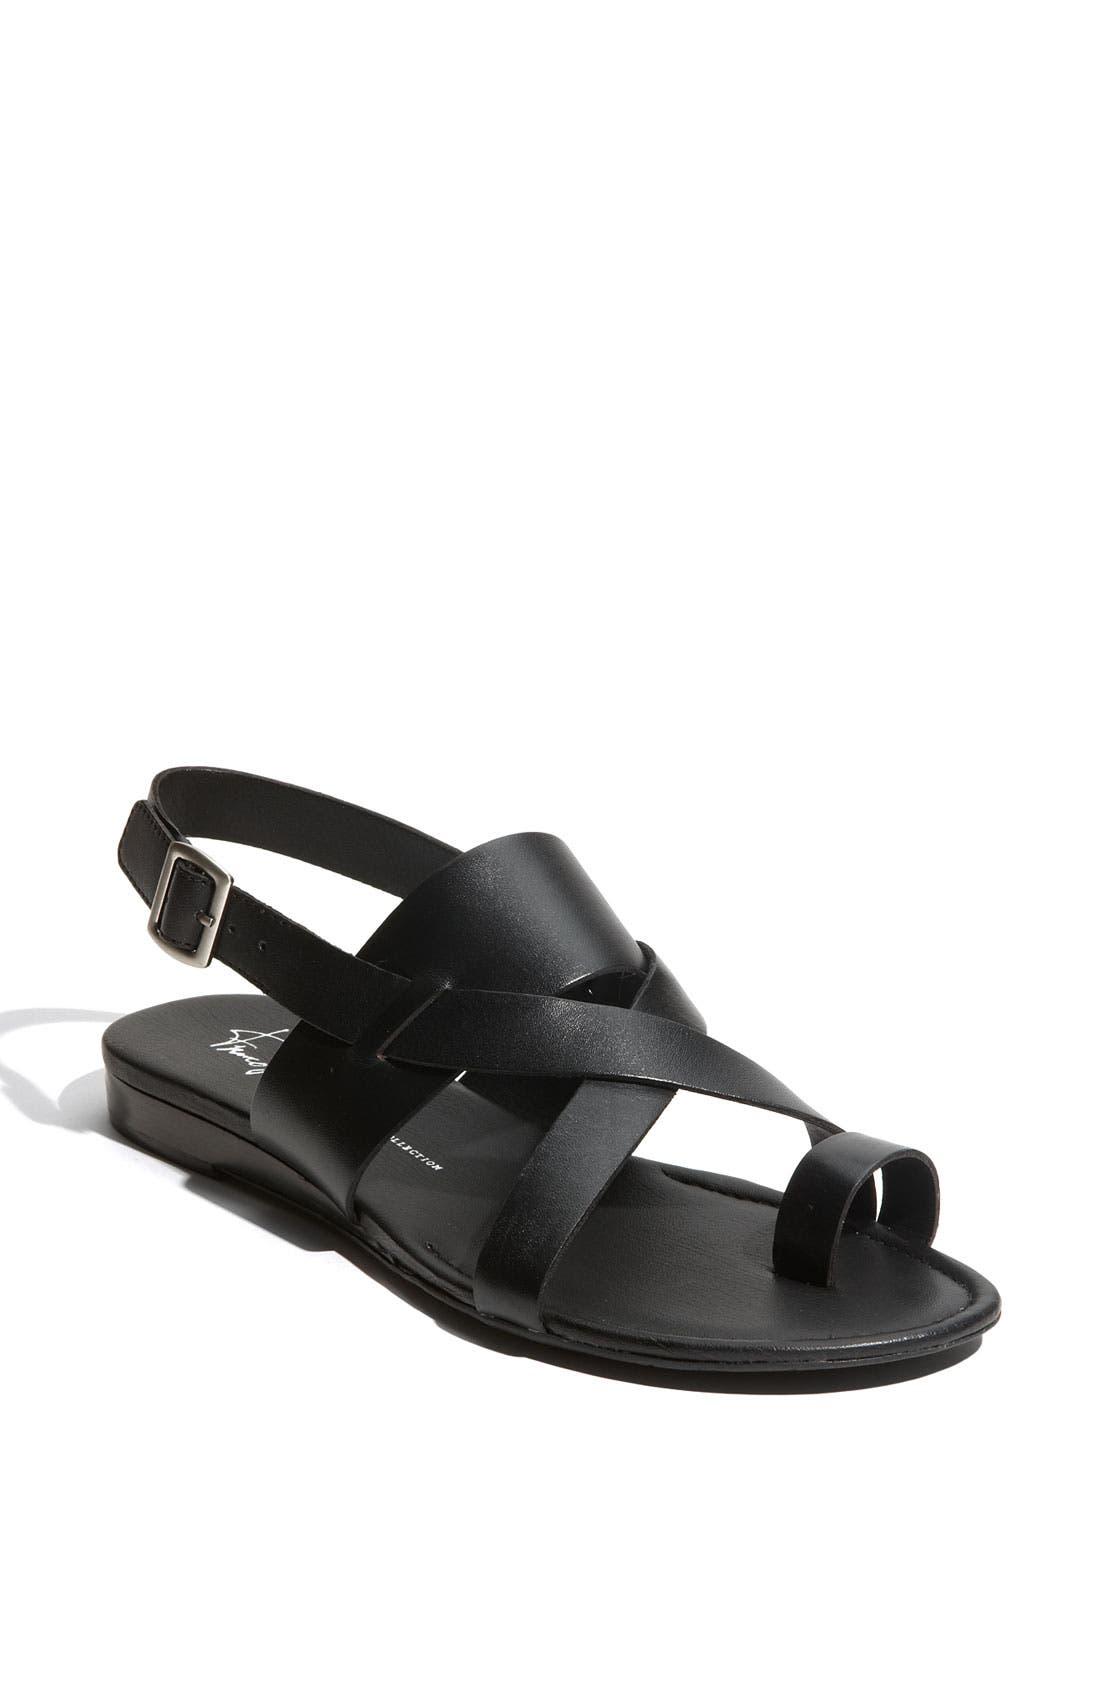 Gia Sandal,                         Main,                         color, Black Antanado